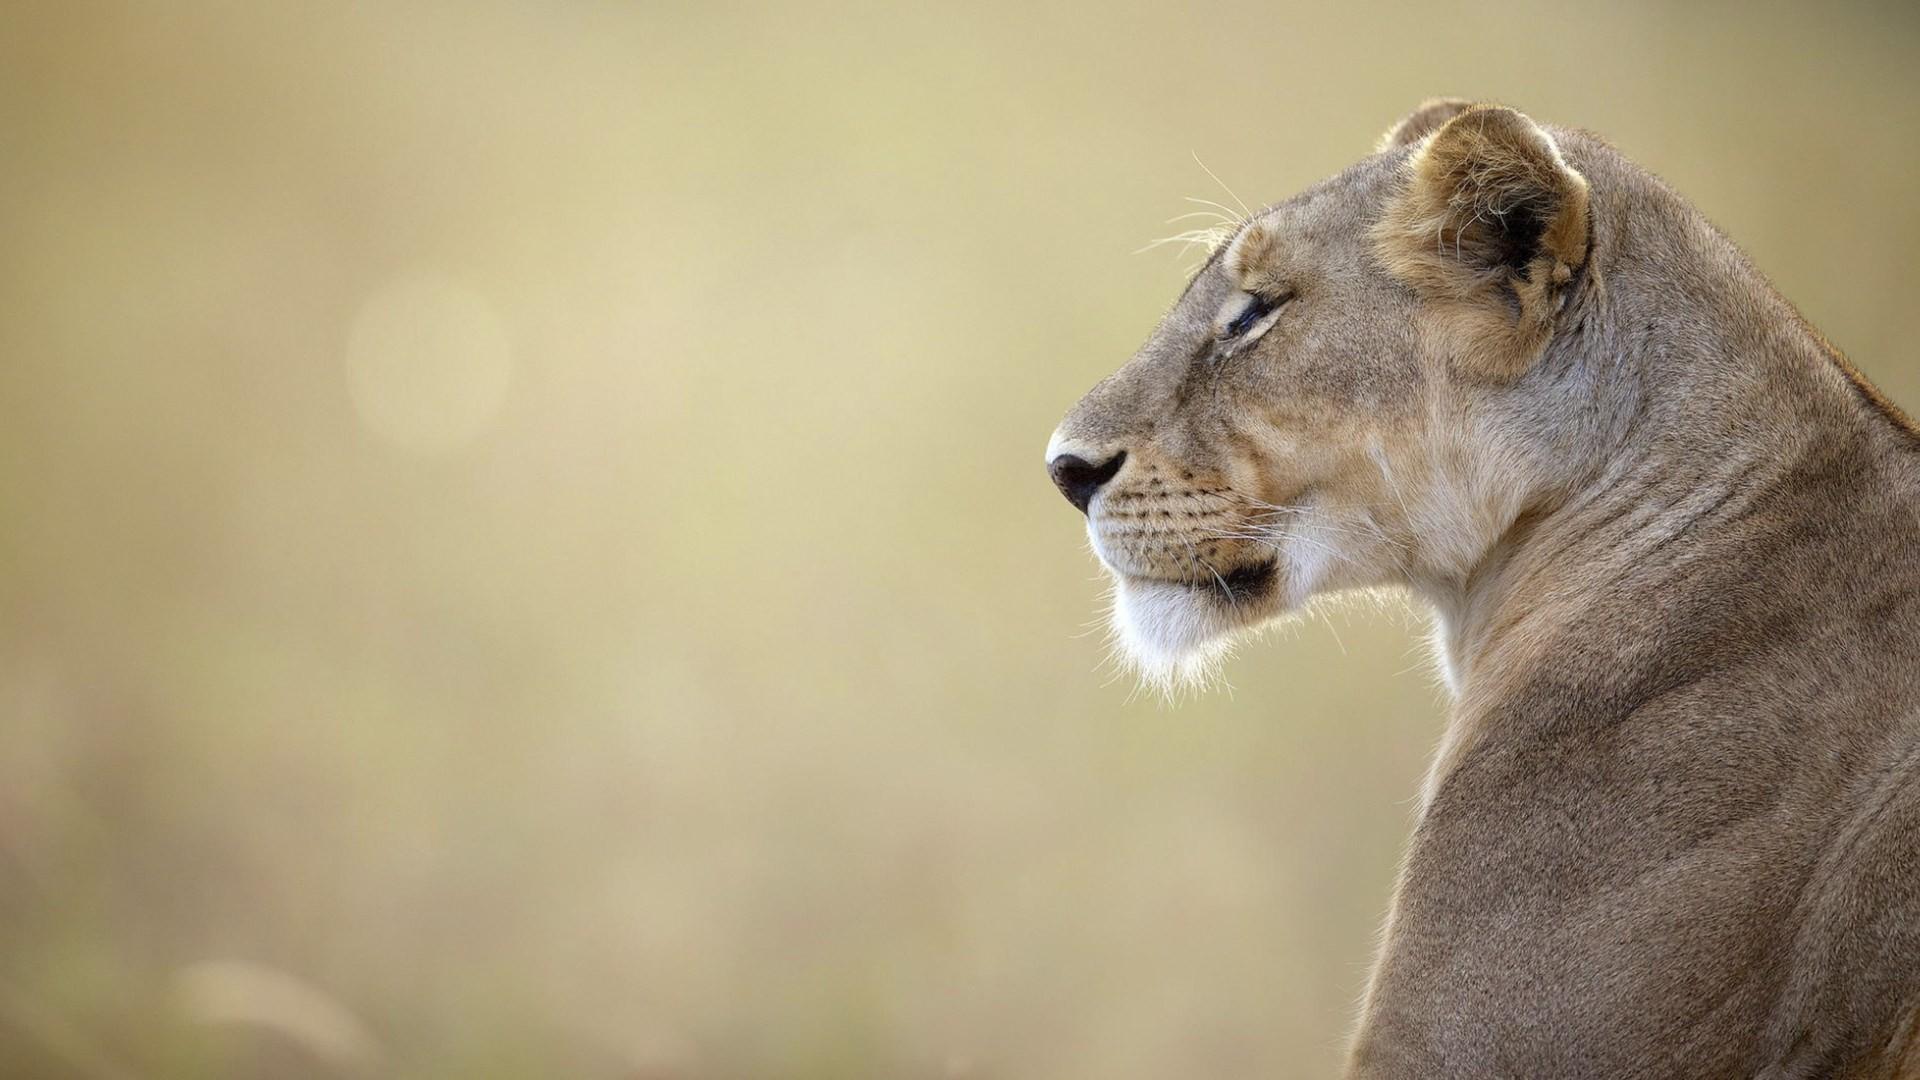 lion screensavers backgrounds – lion category